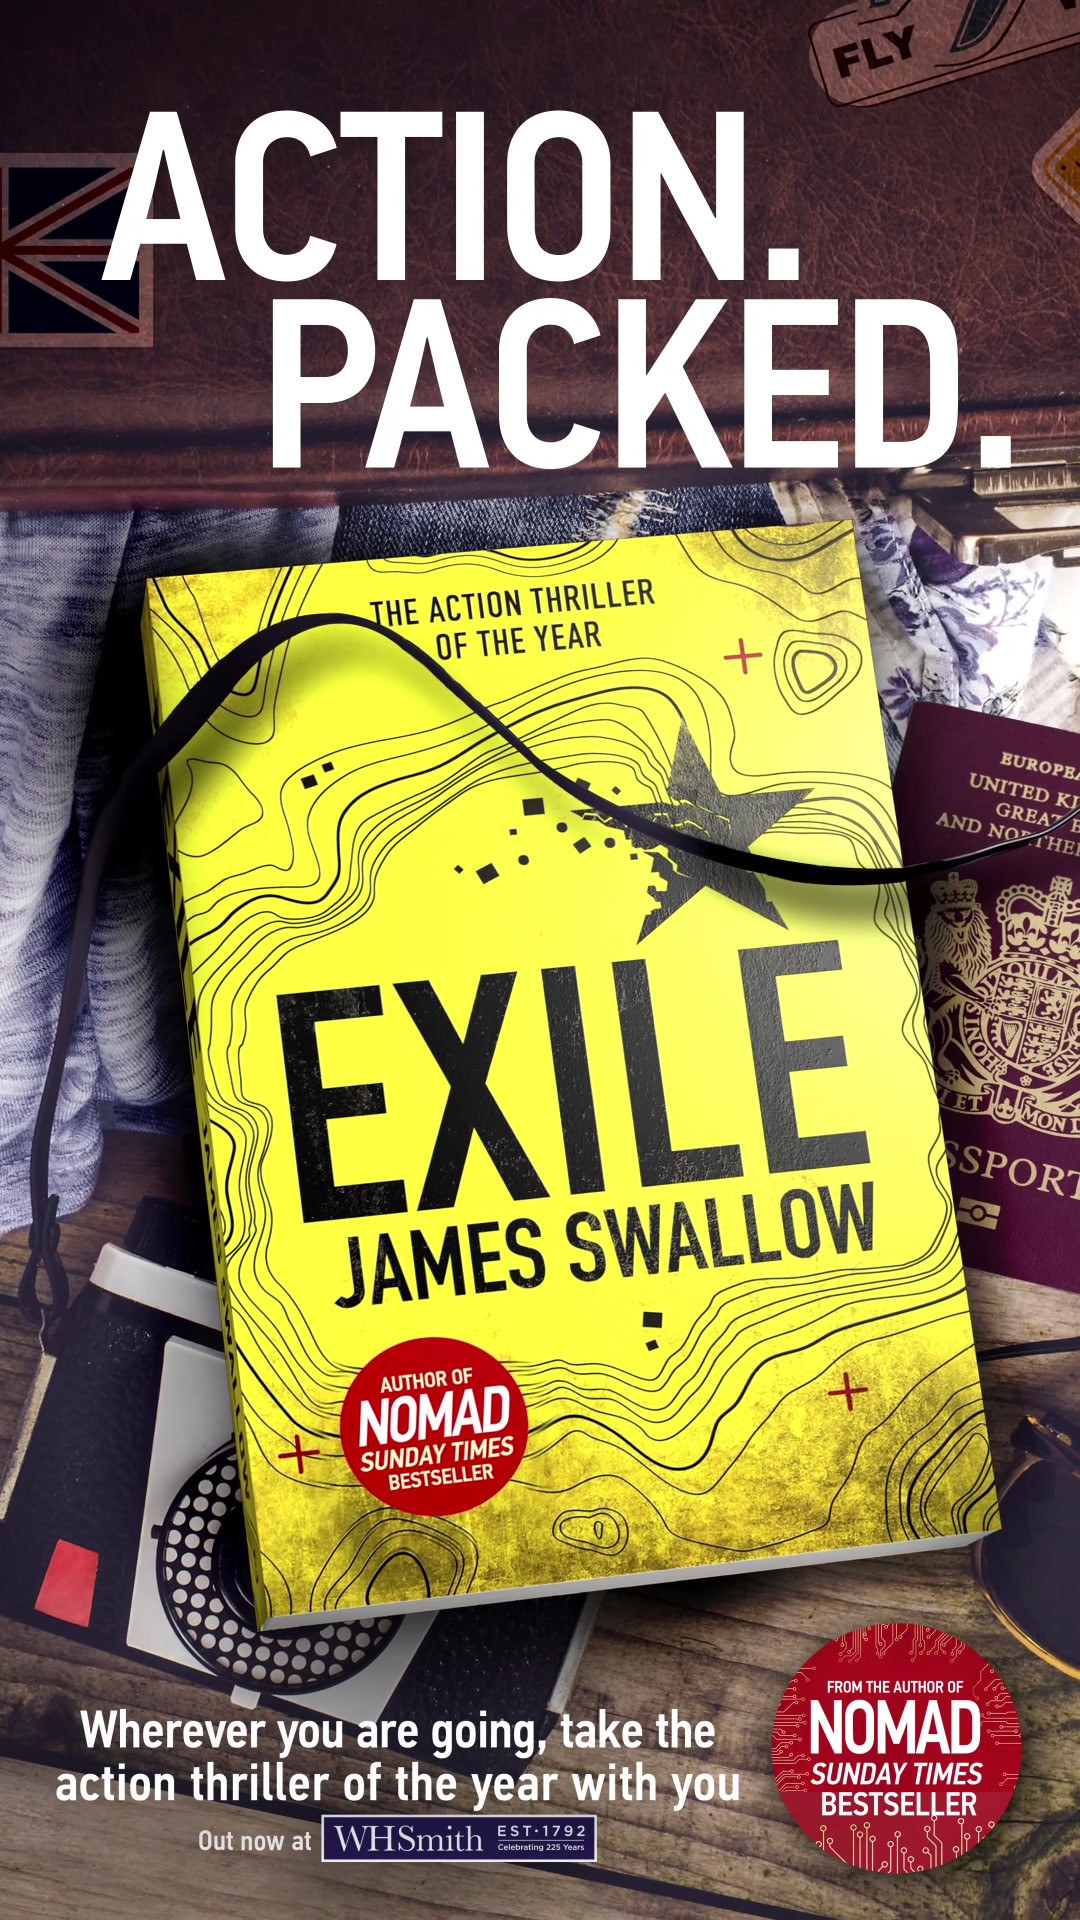 Exile James Swallow